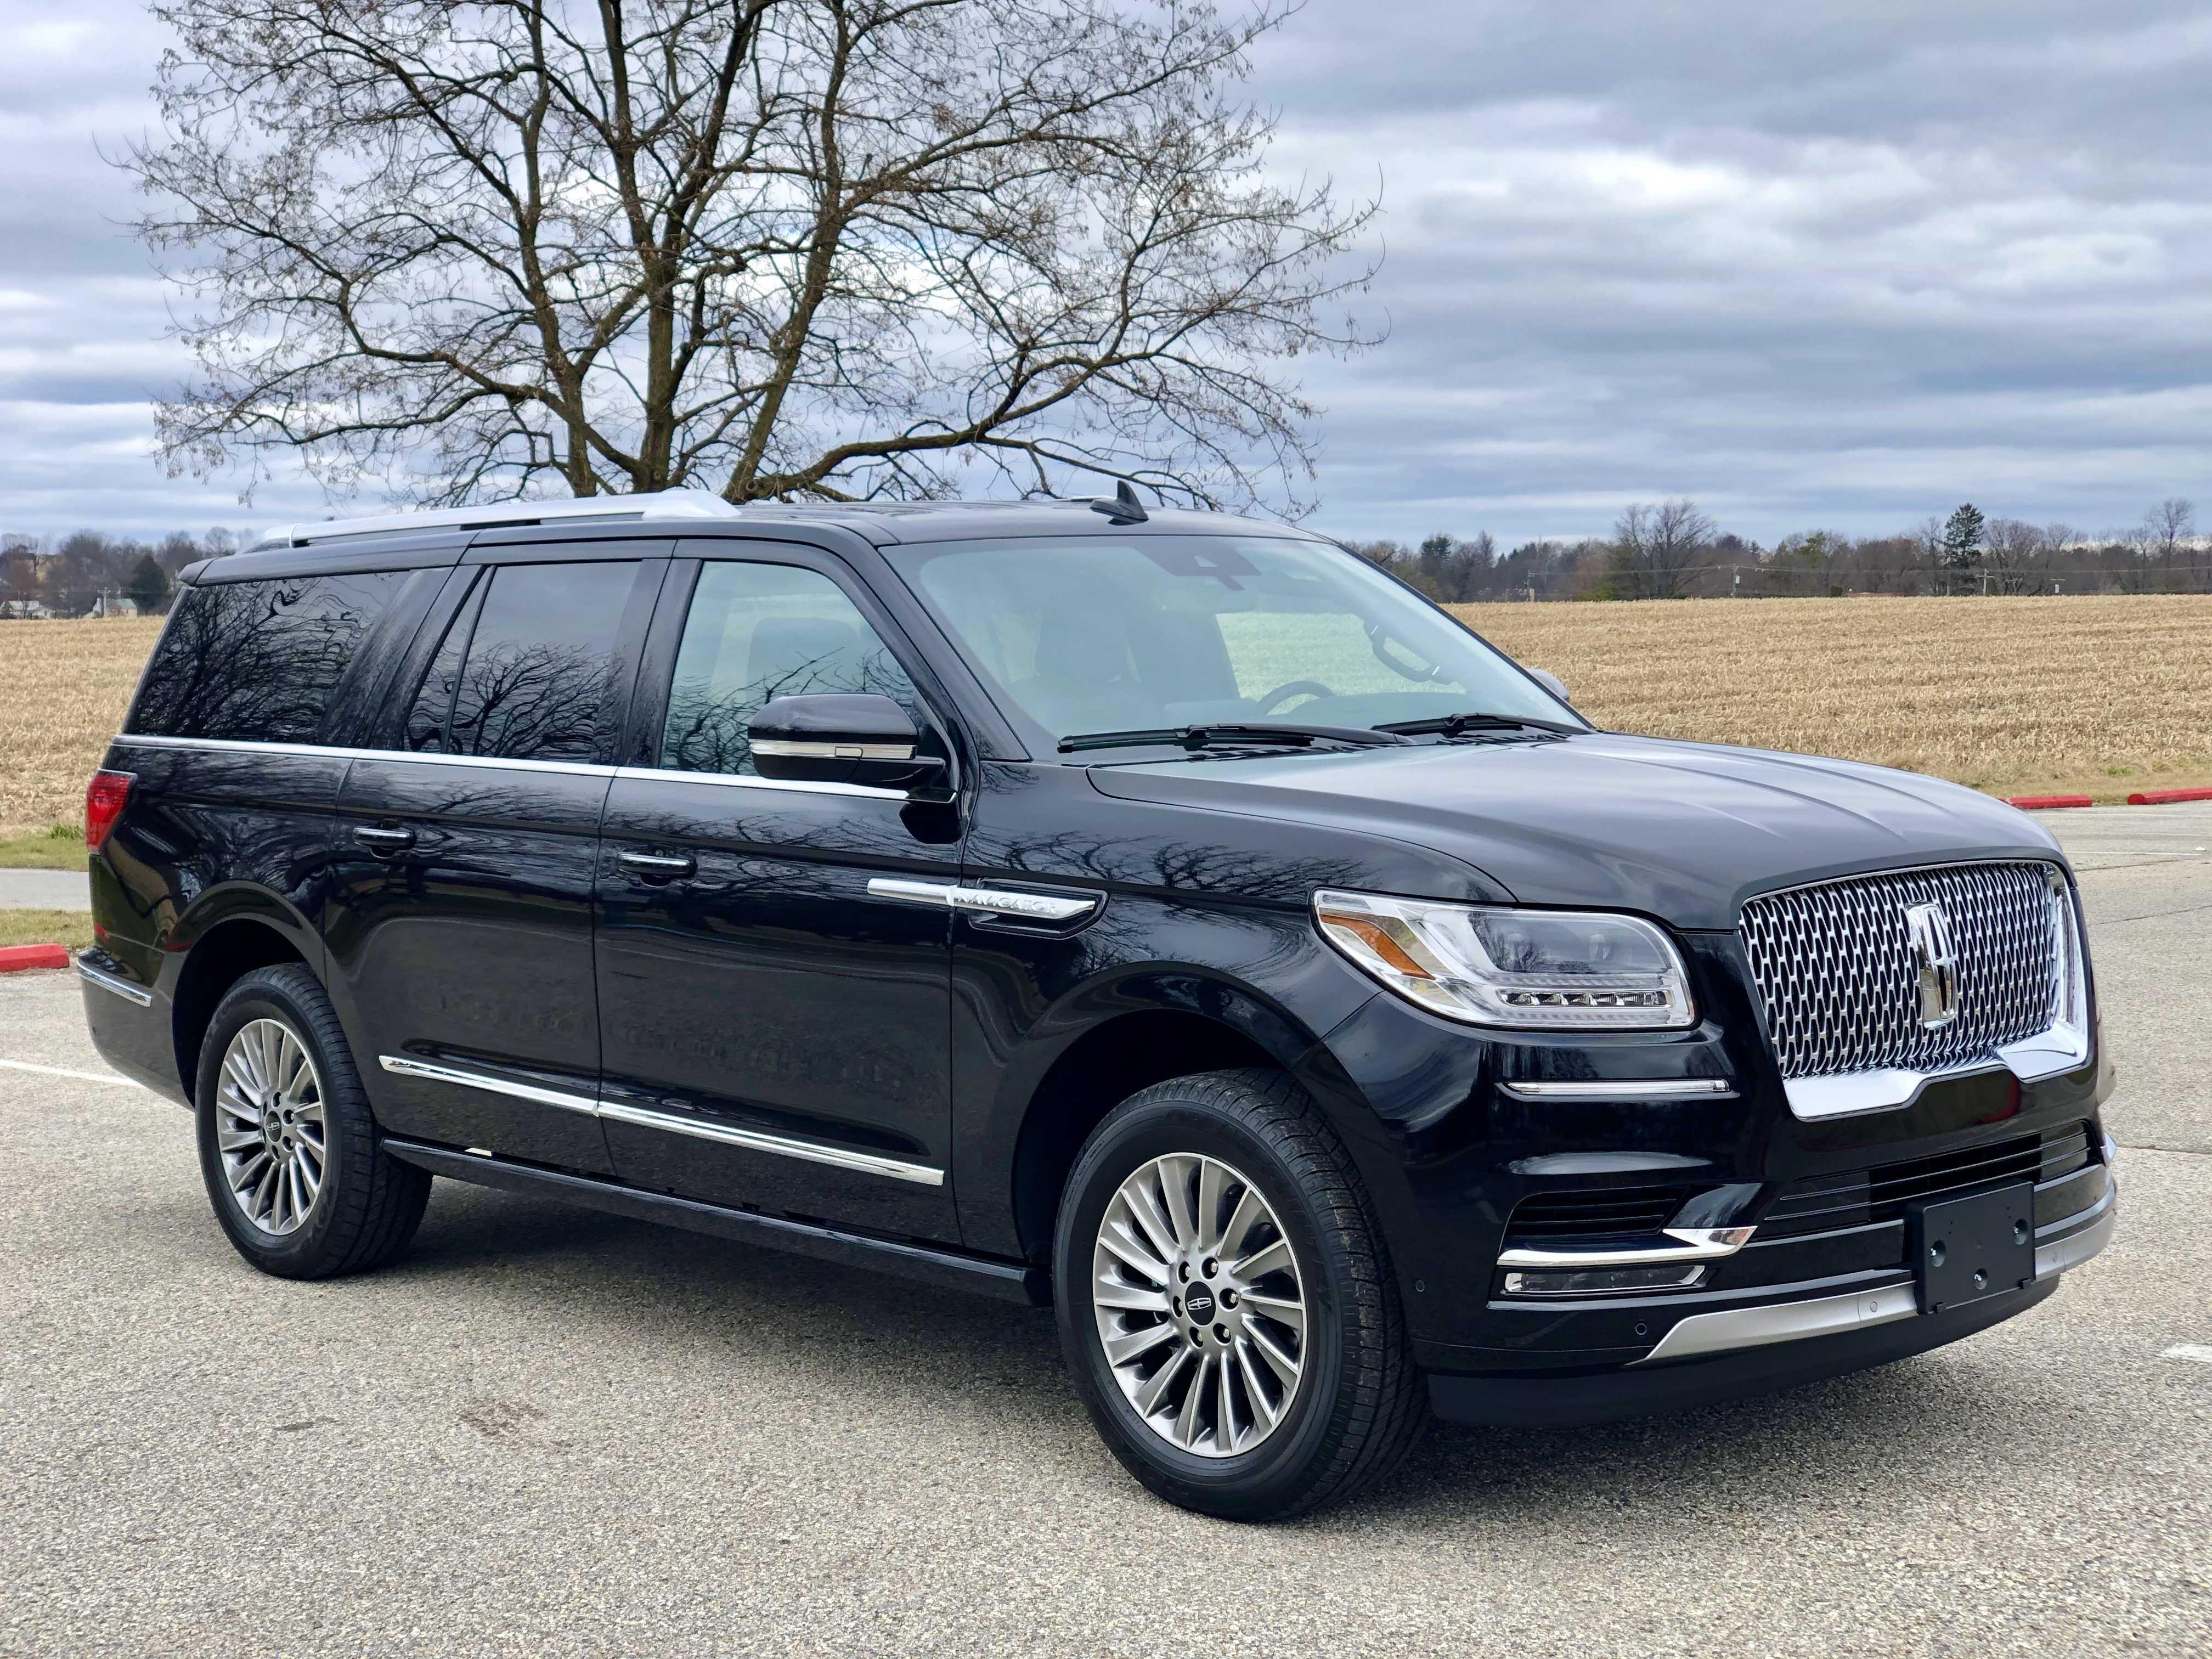 Lincoln navigator 2019 2020 года | все про авто